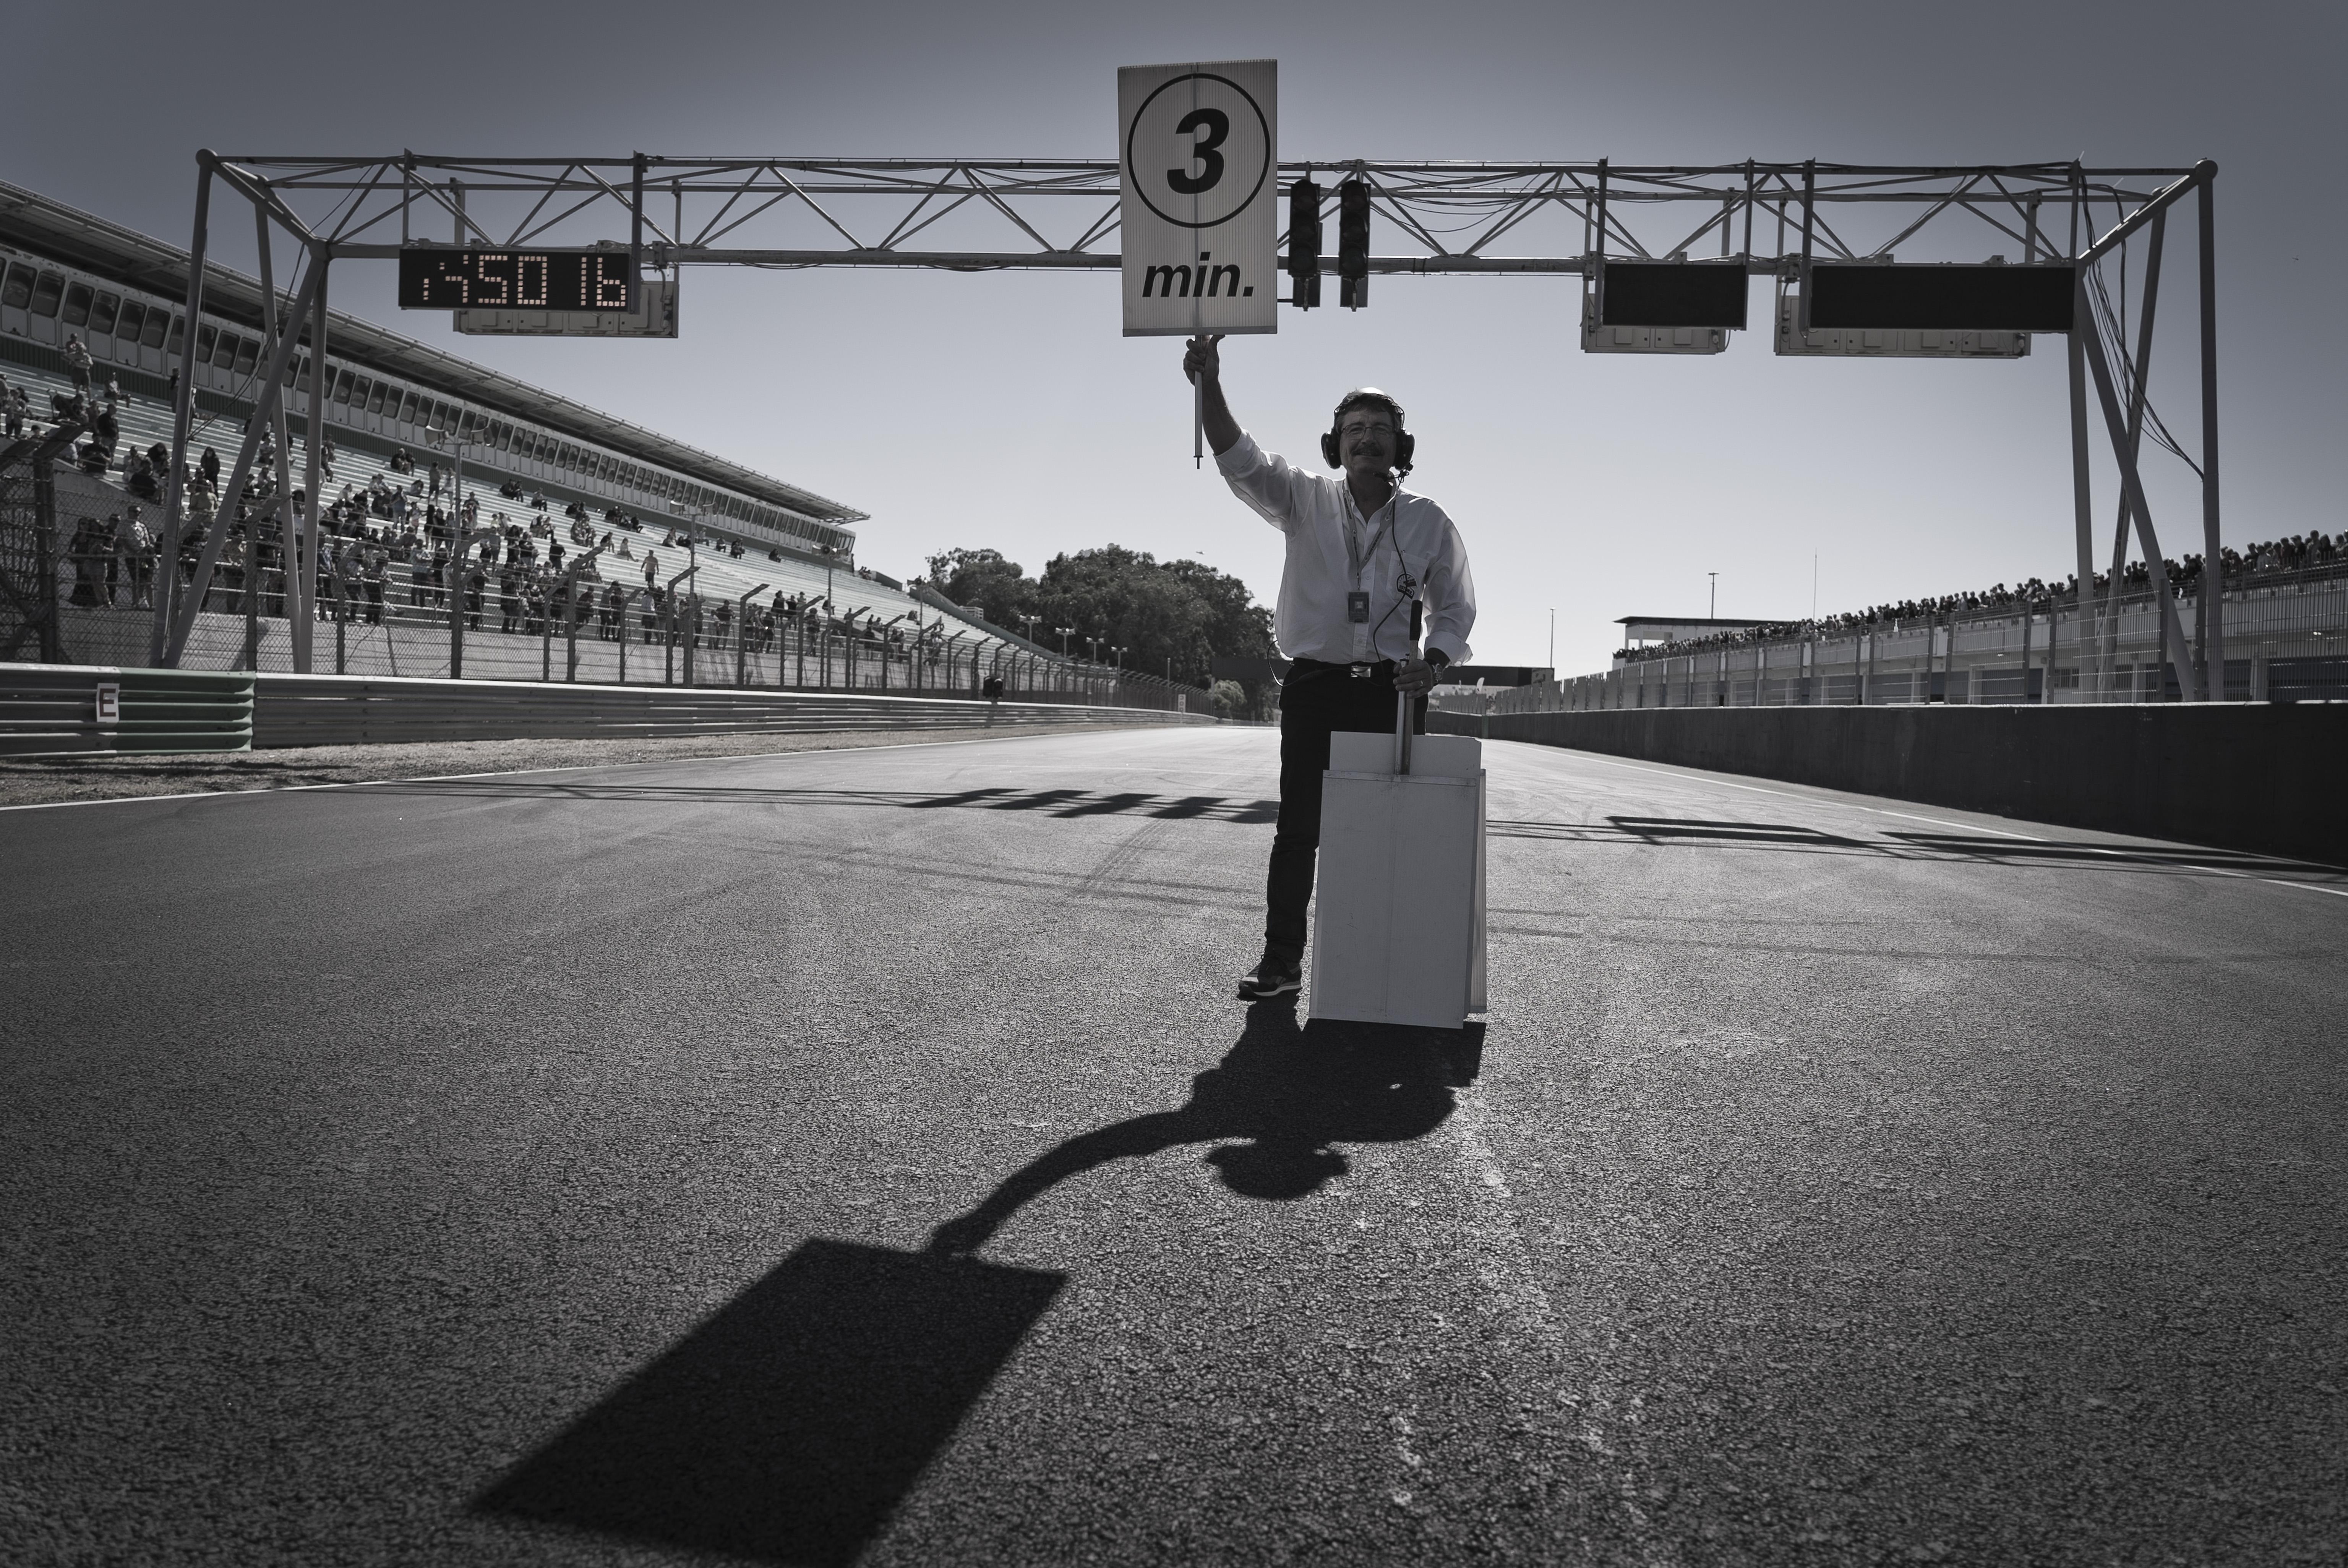 estoril classic race